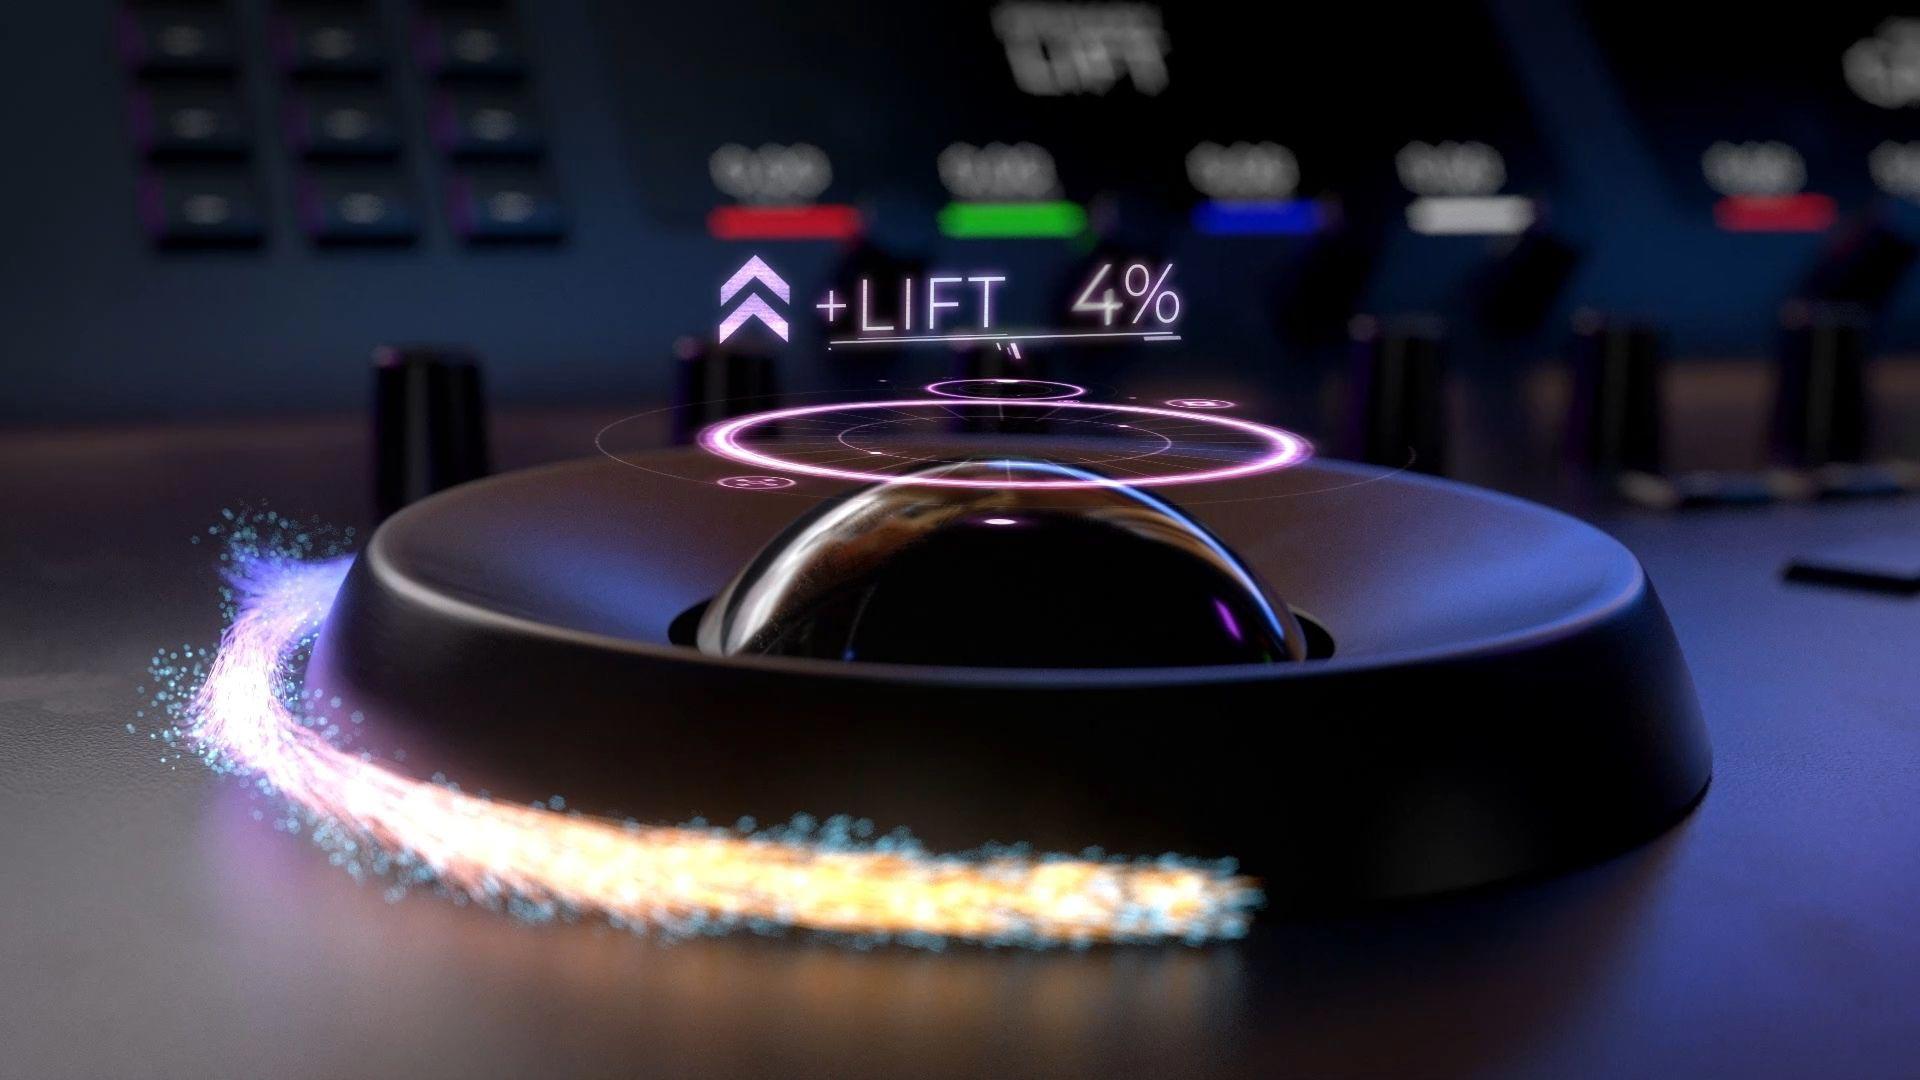 Colourlab Ai: Artificial Intelligence revolutionizes color grading